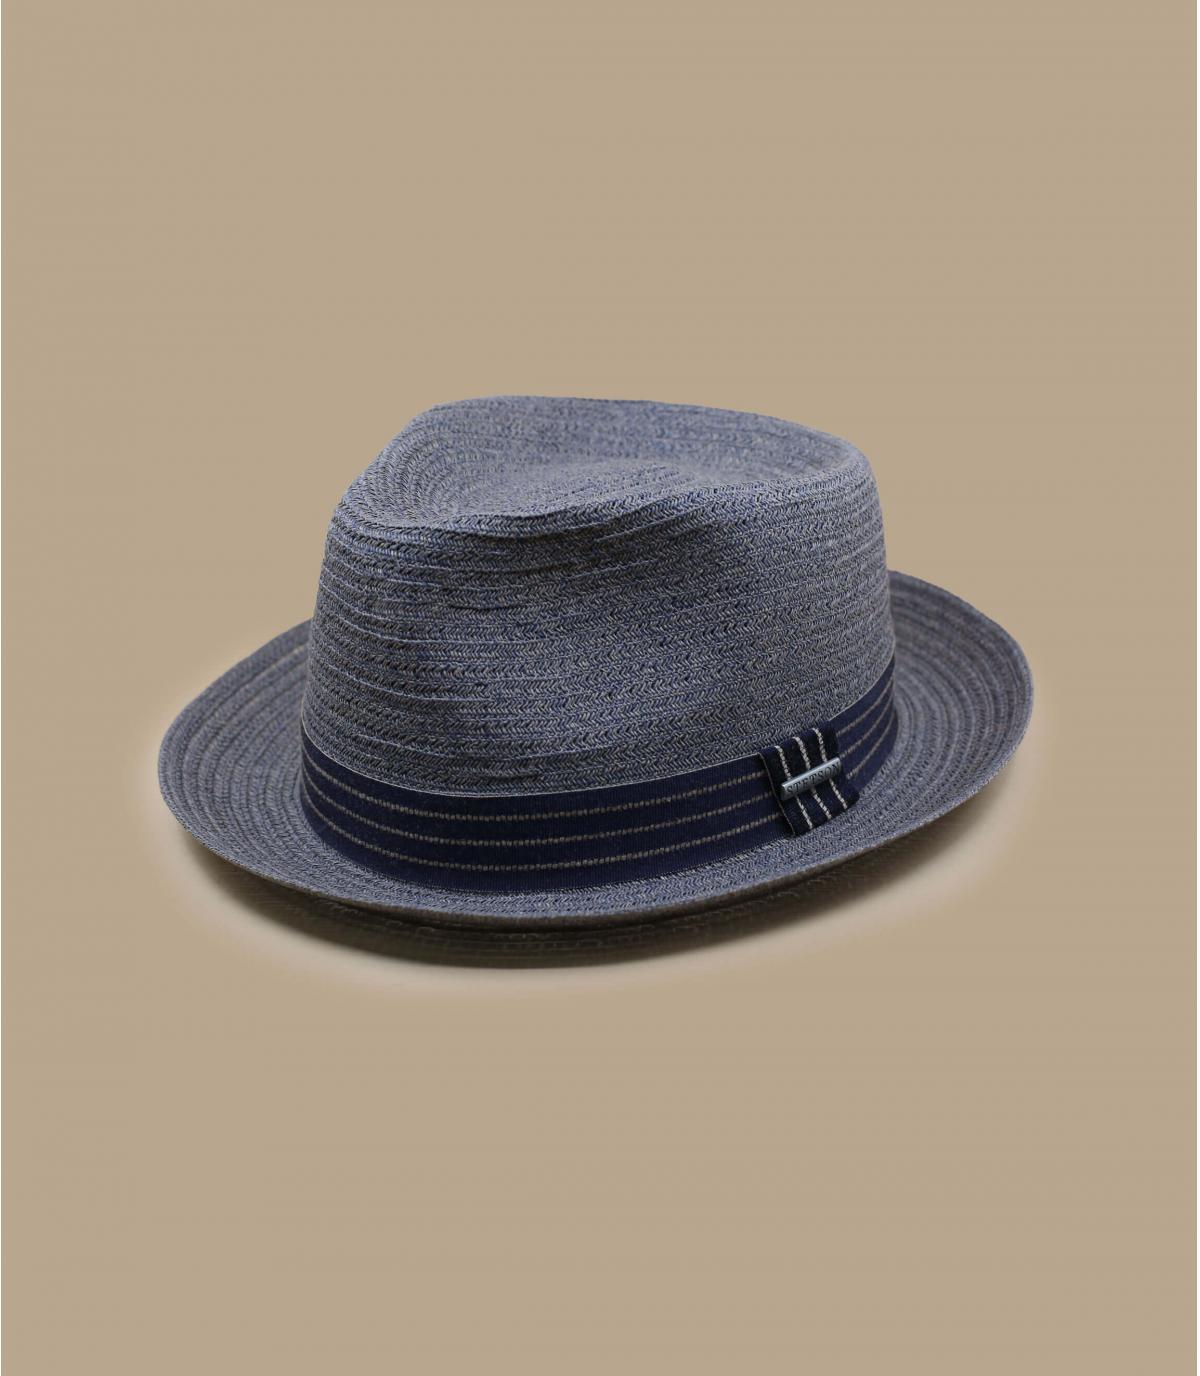 Details Fedora Toyo blue mix - afbeeling 2